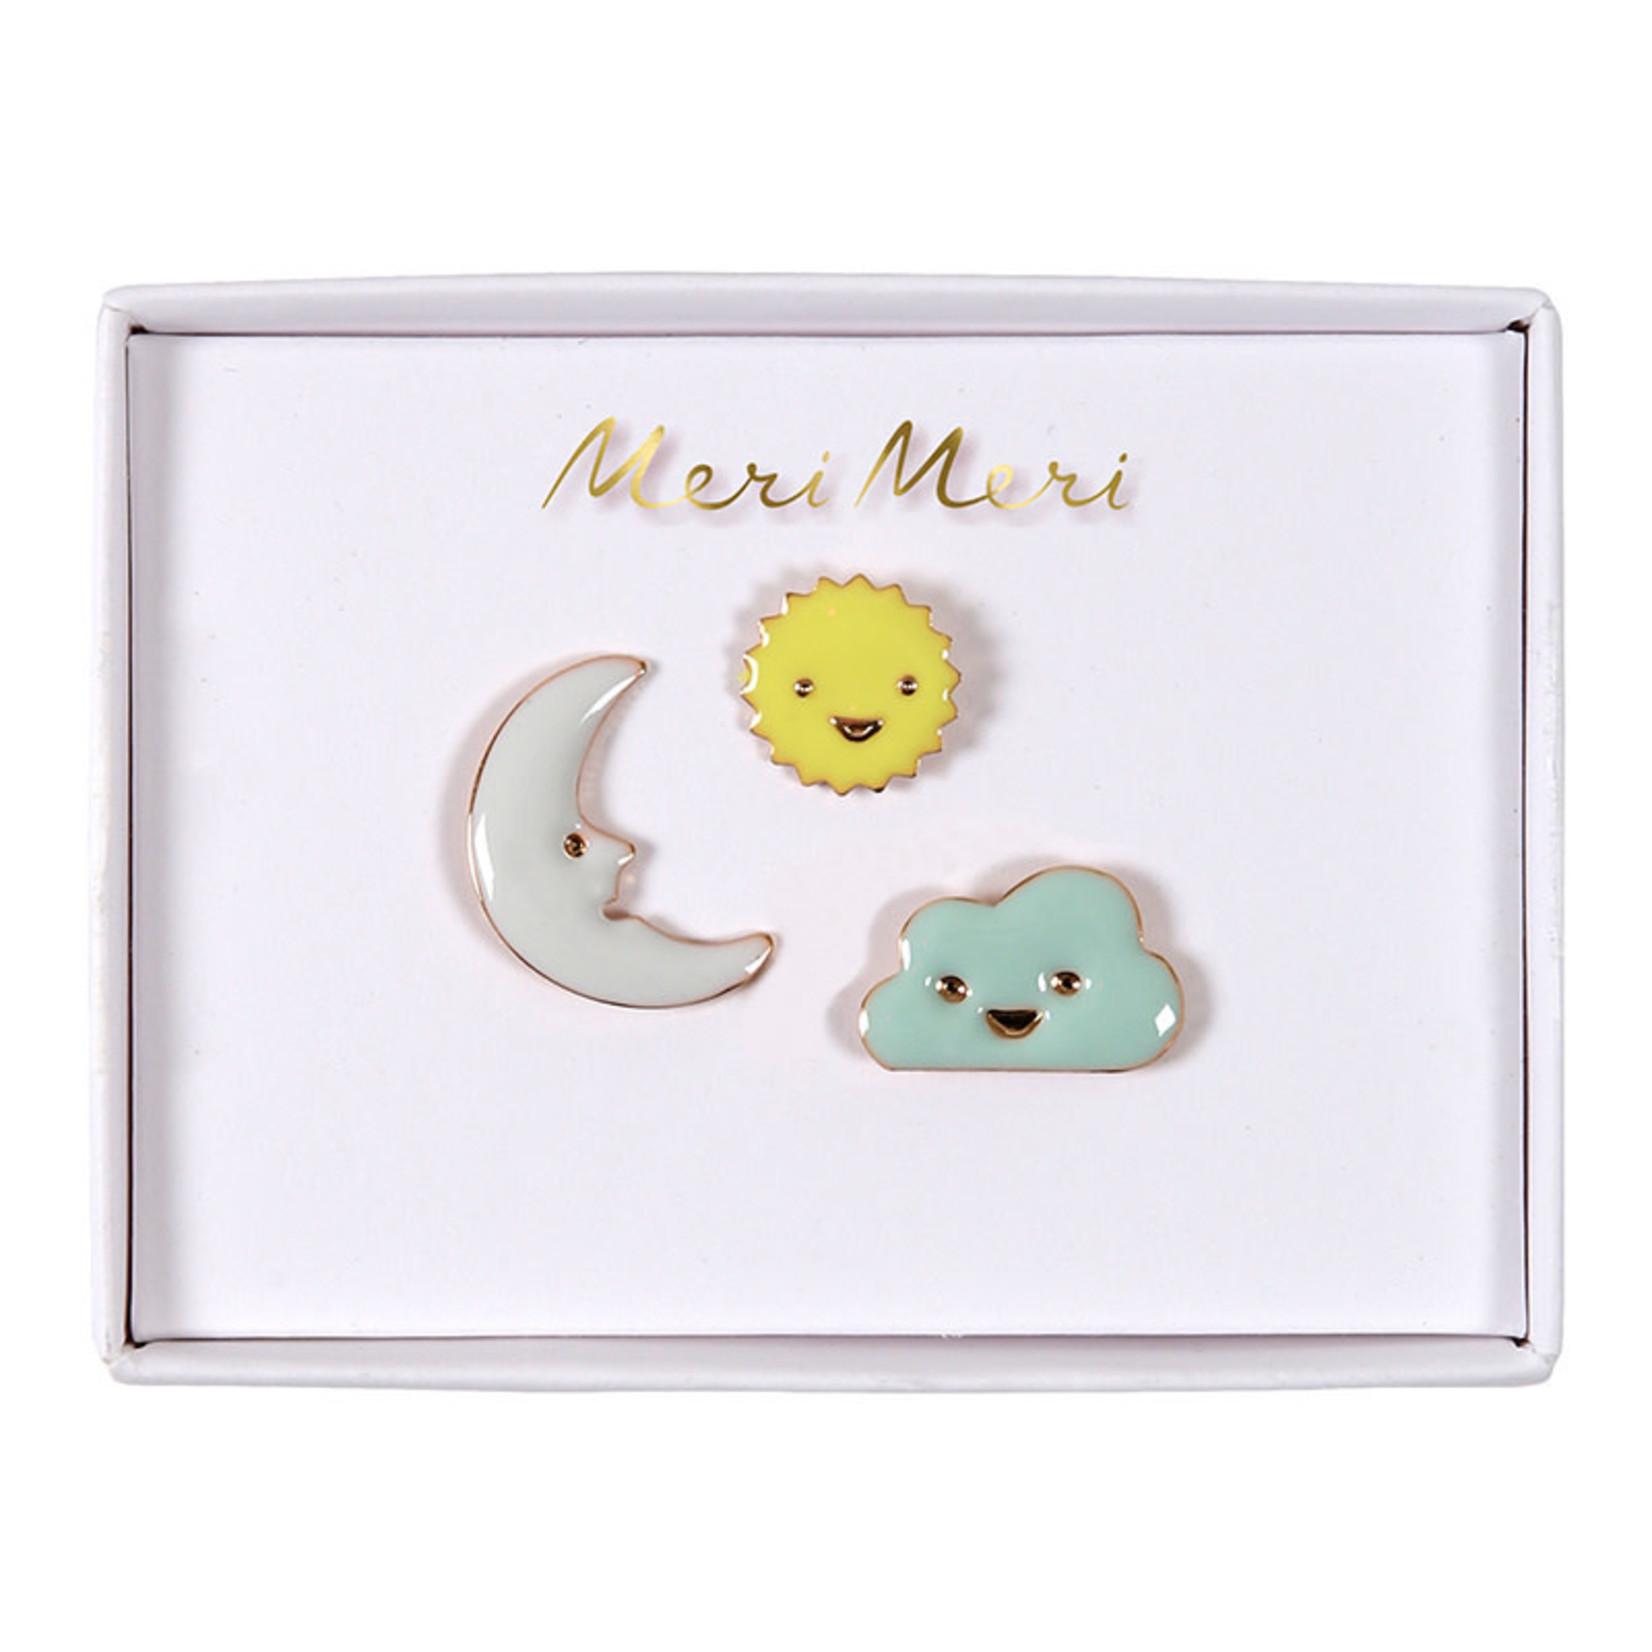 Meri Meri • emaille pins sun, moon & clouds